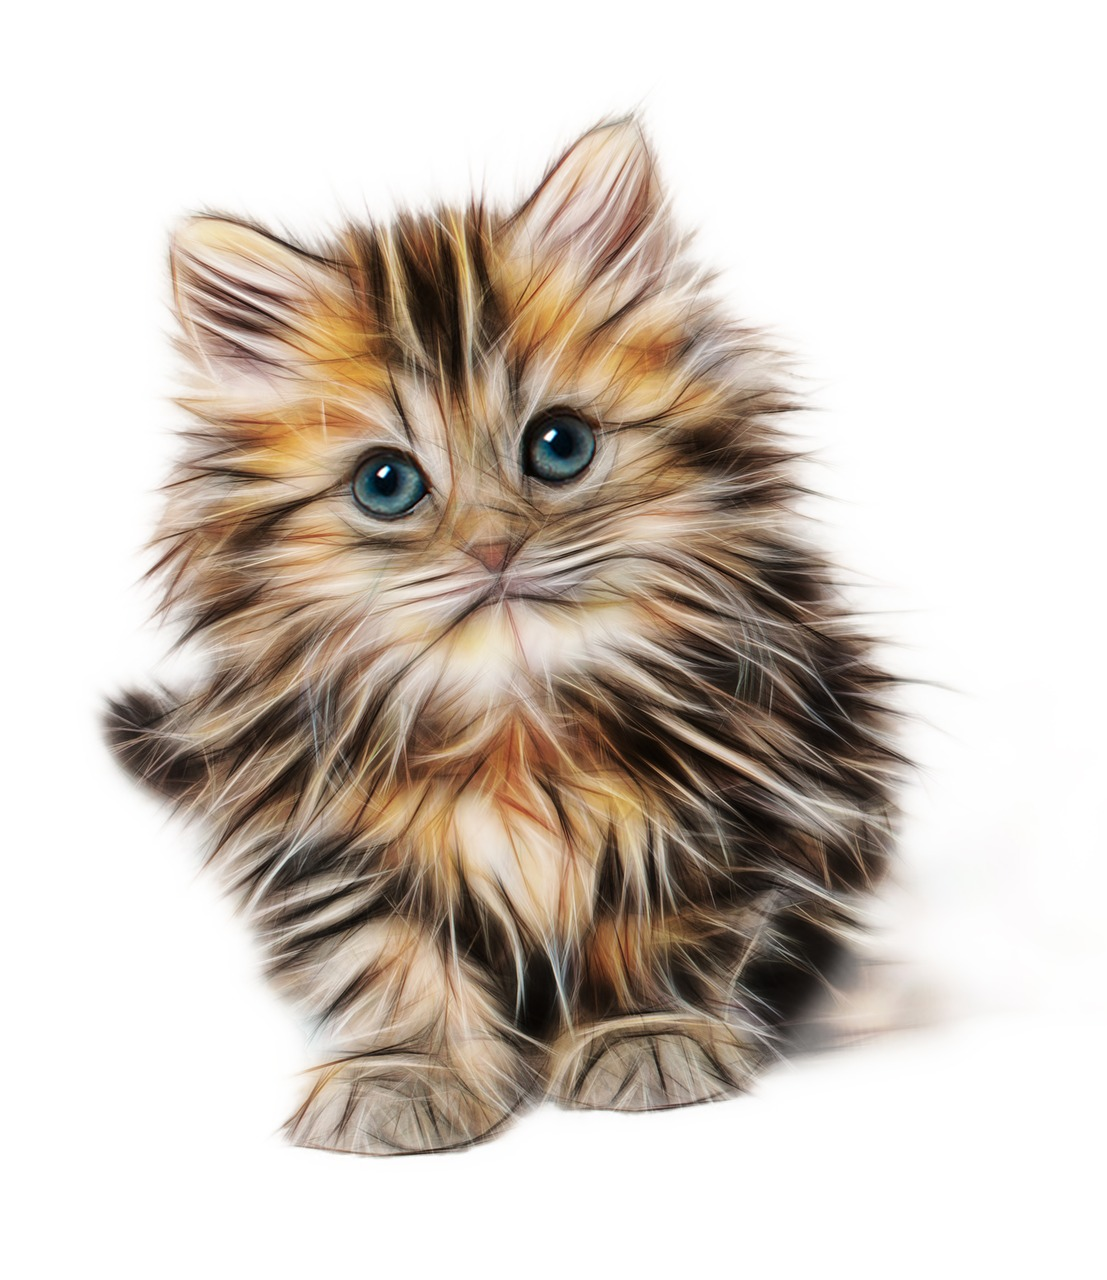 kitten-1582384_1280.jpg